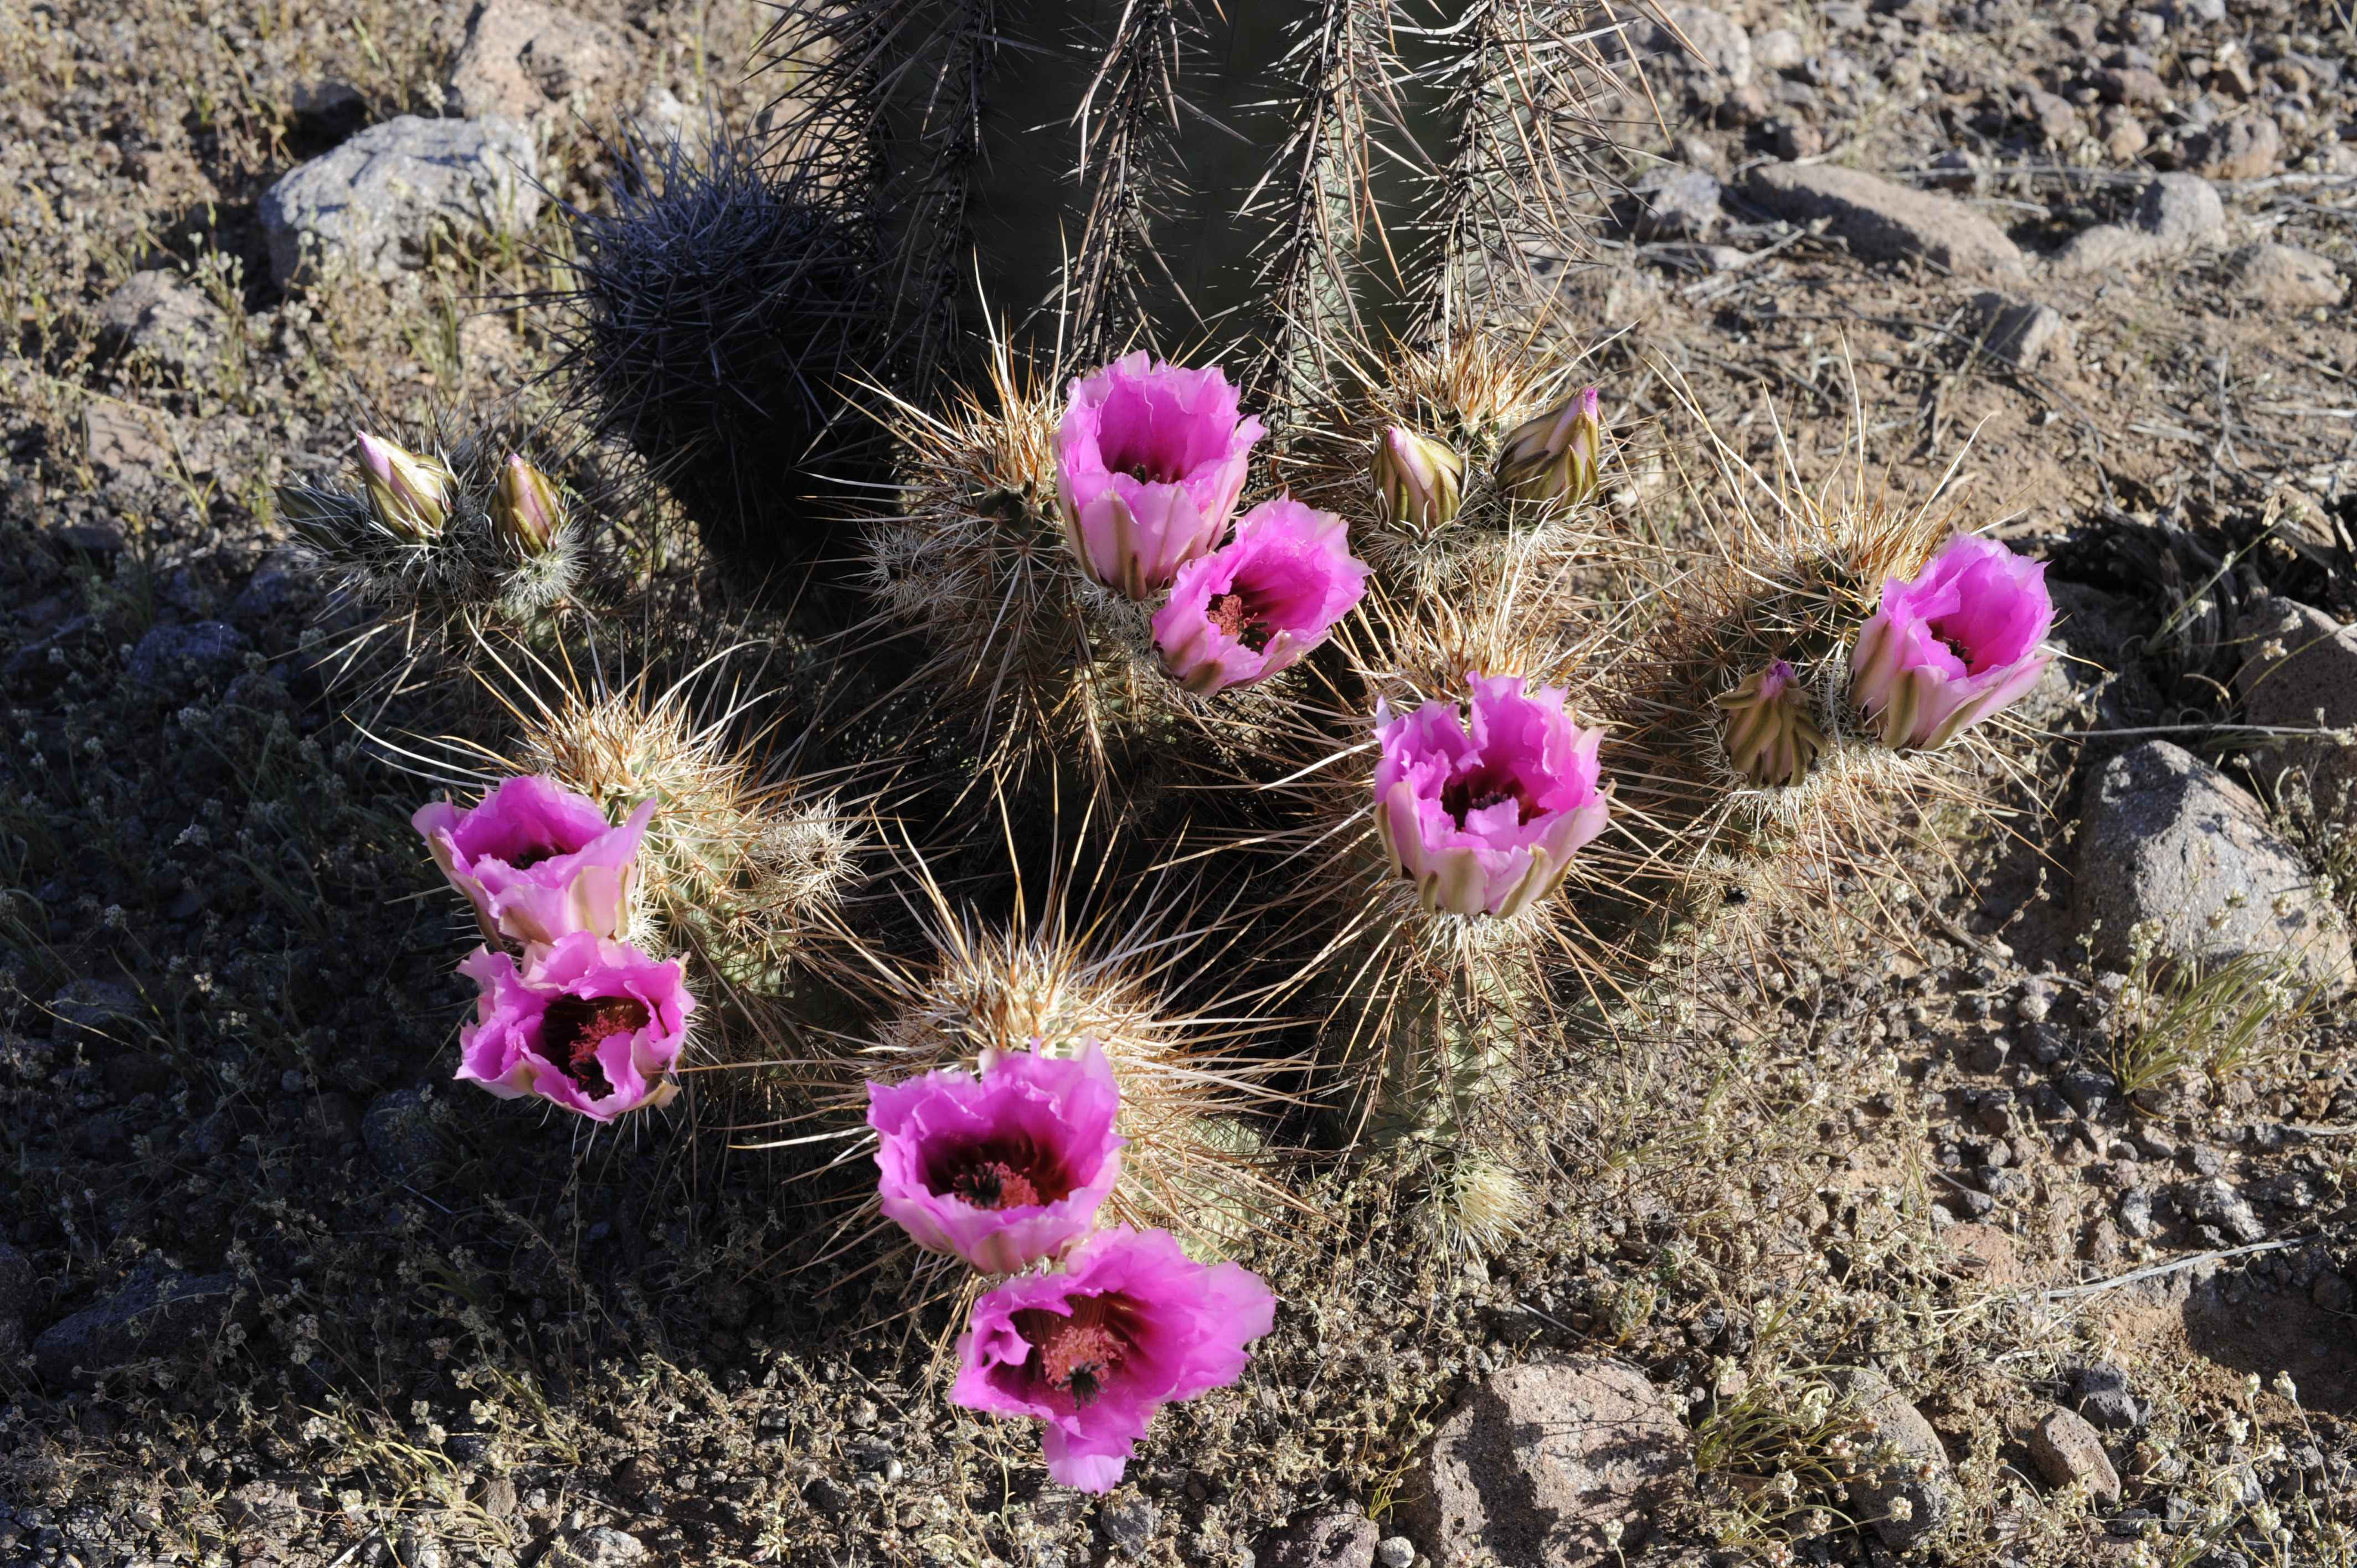 File Ping purple flowering barrel cactus in the sonoran desert